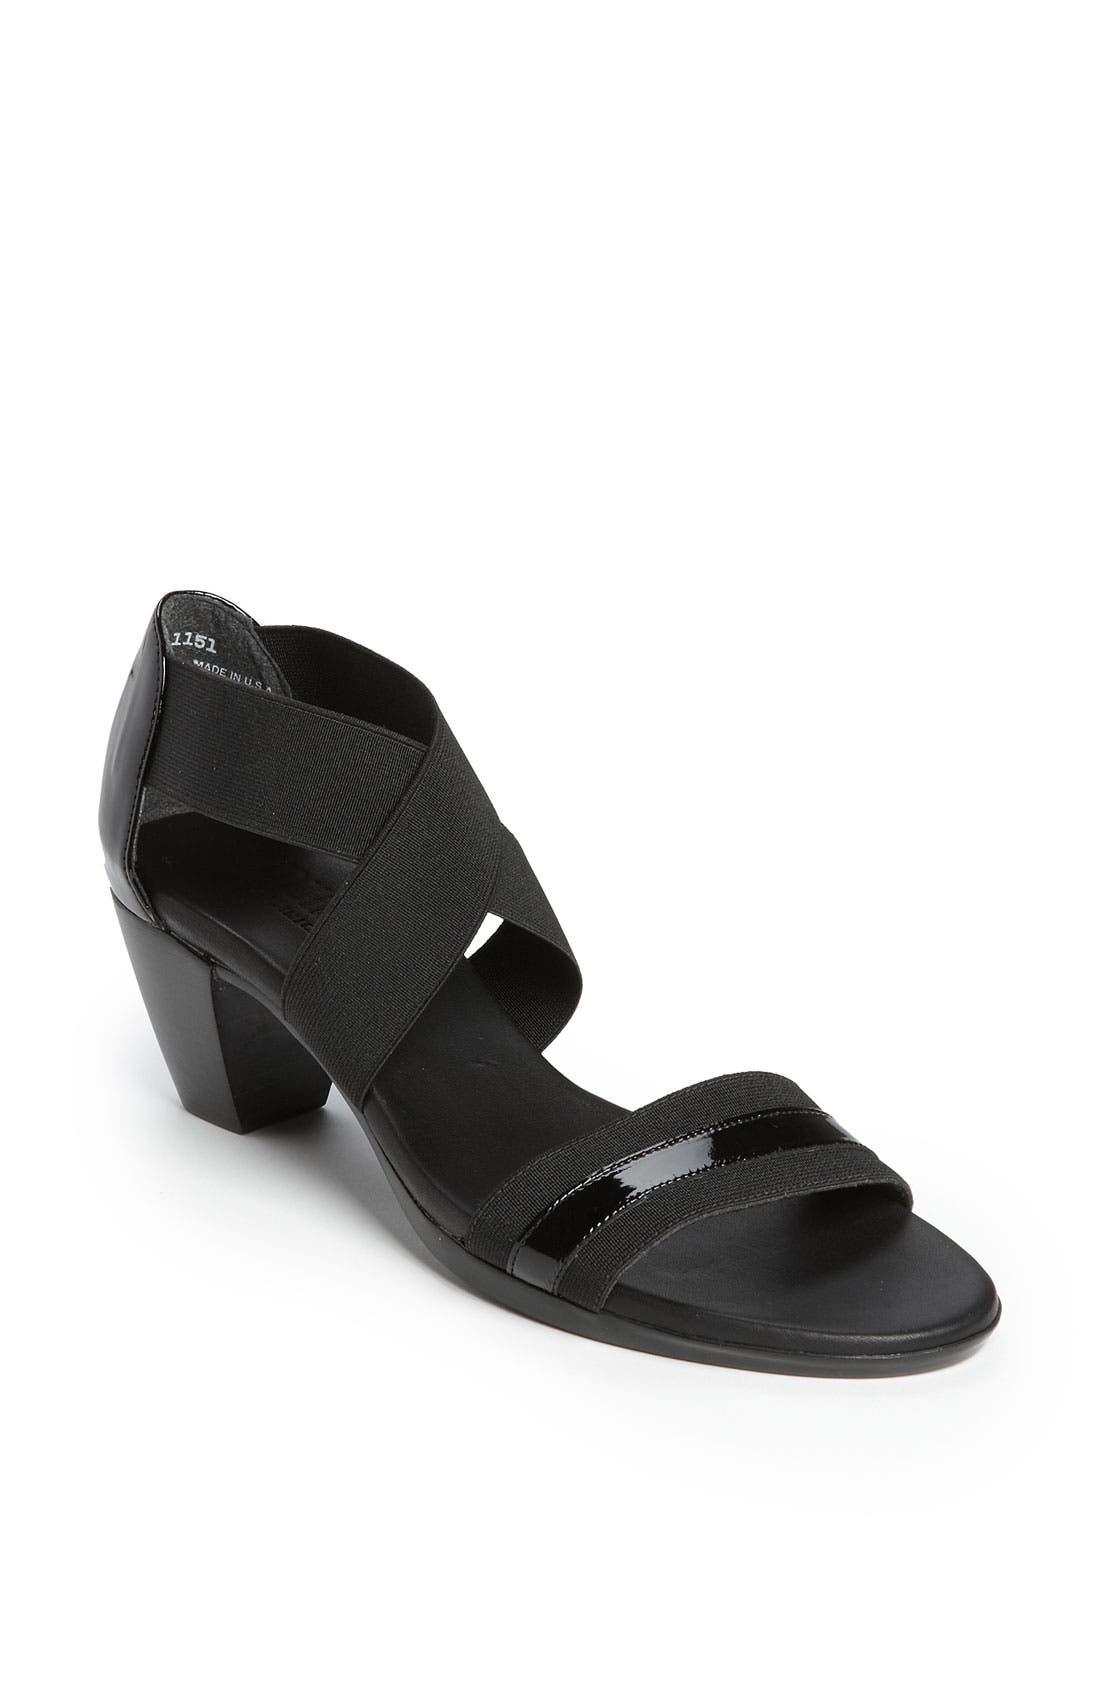 Main Image - Munro 'Delana' Sandal